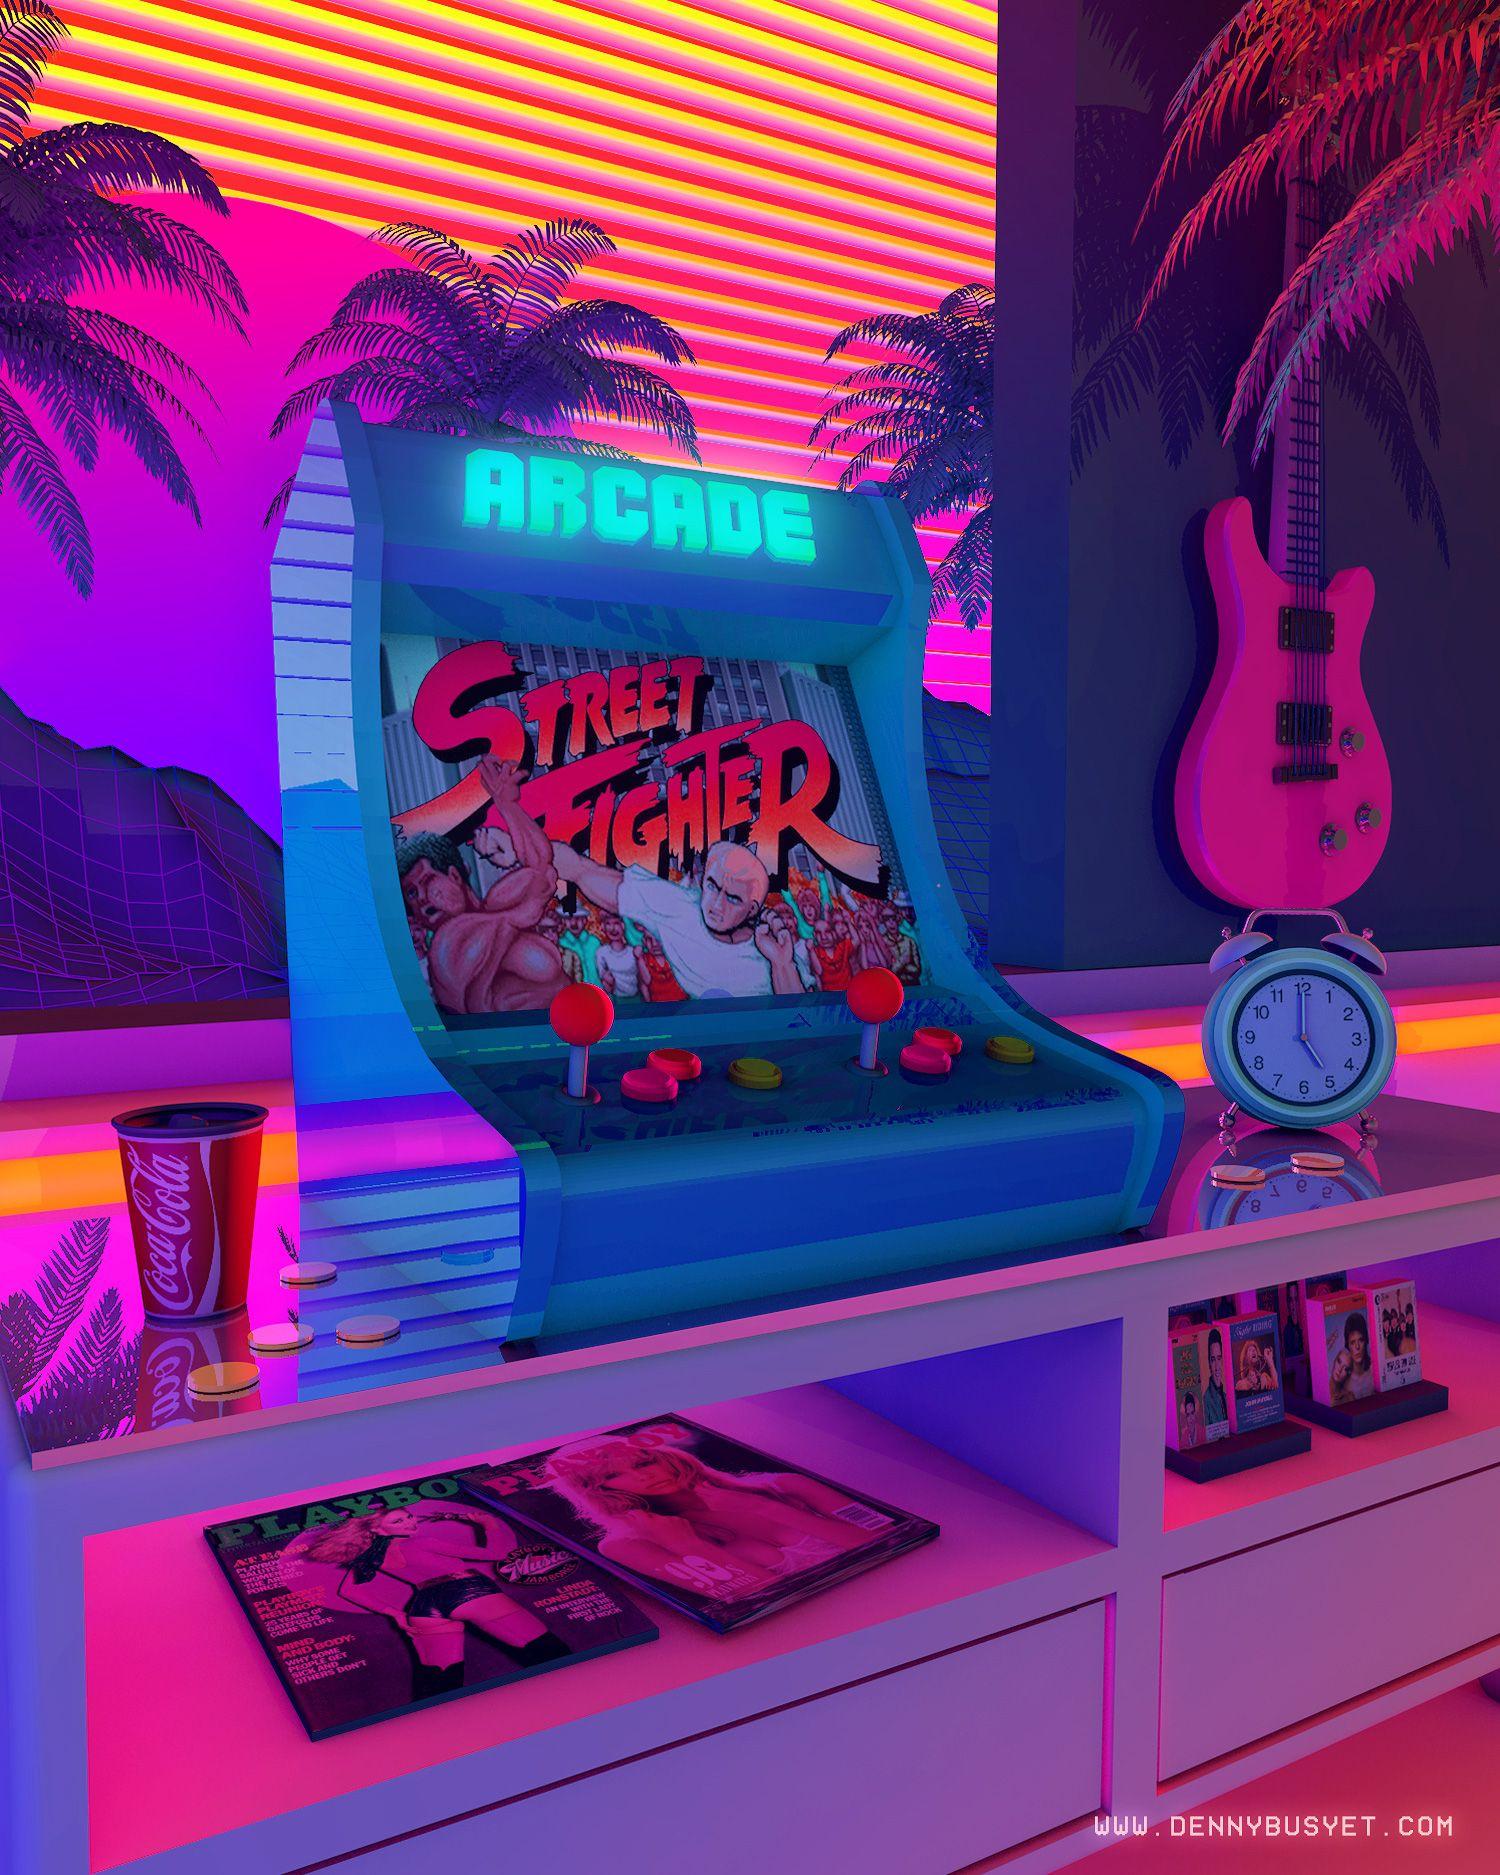 Arcade Dreams By Denny Busyet Cyberpunk Aesthetic Retro Waves Vaporwave